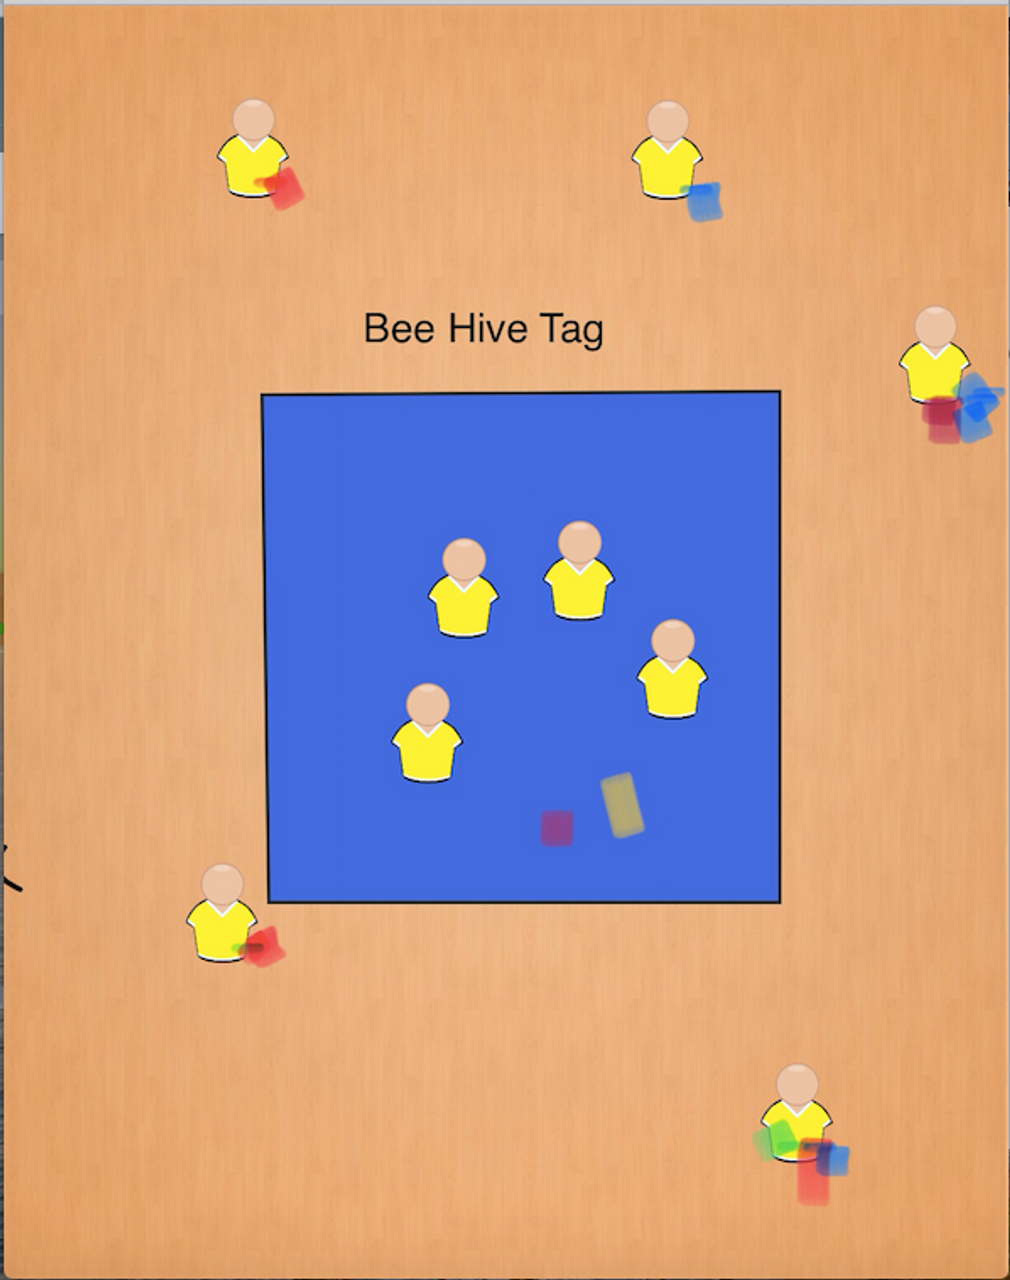 Bee Hive Tag